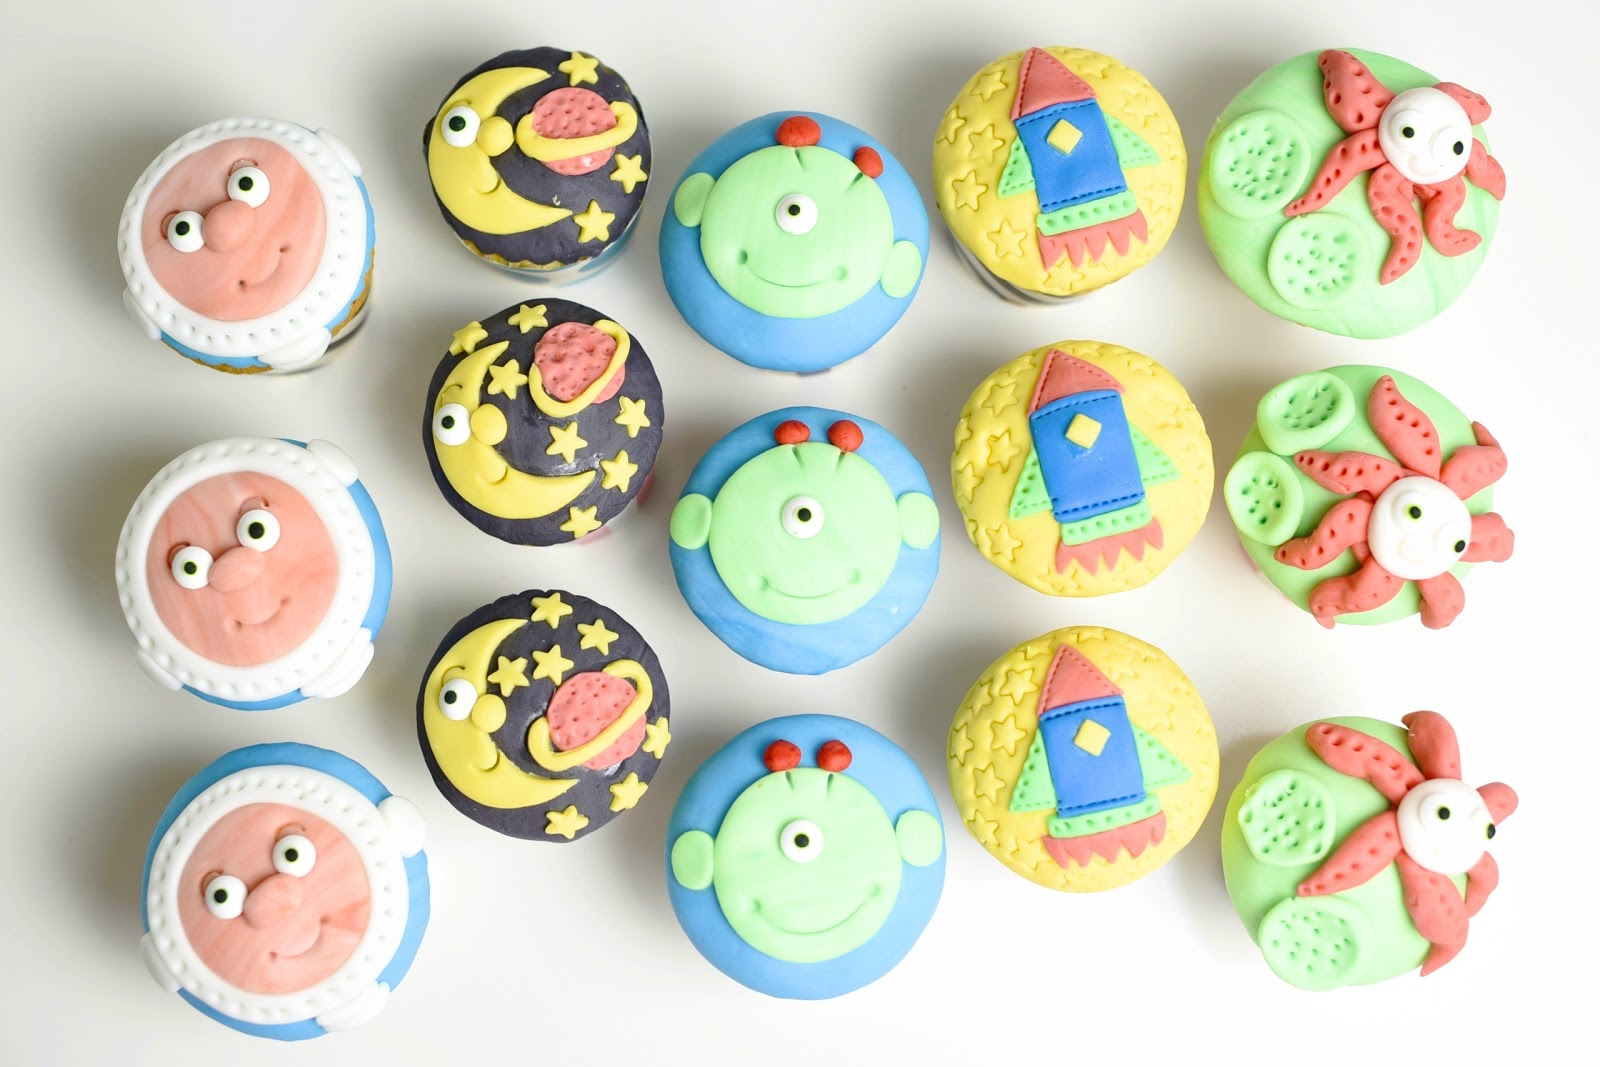 Kessy S Pink Sugar Weltall Muffins Mit Nutellakern Zur Kita